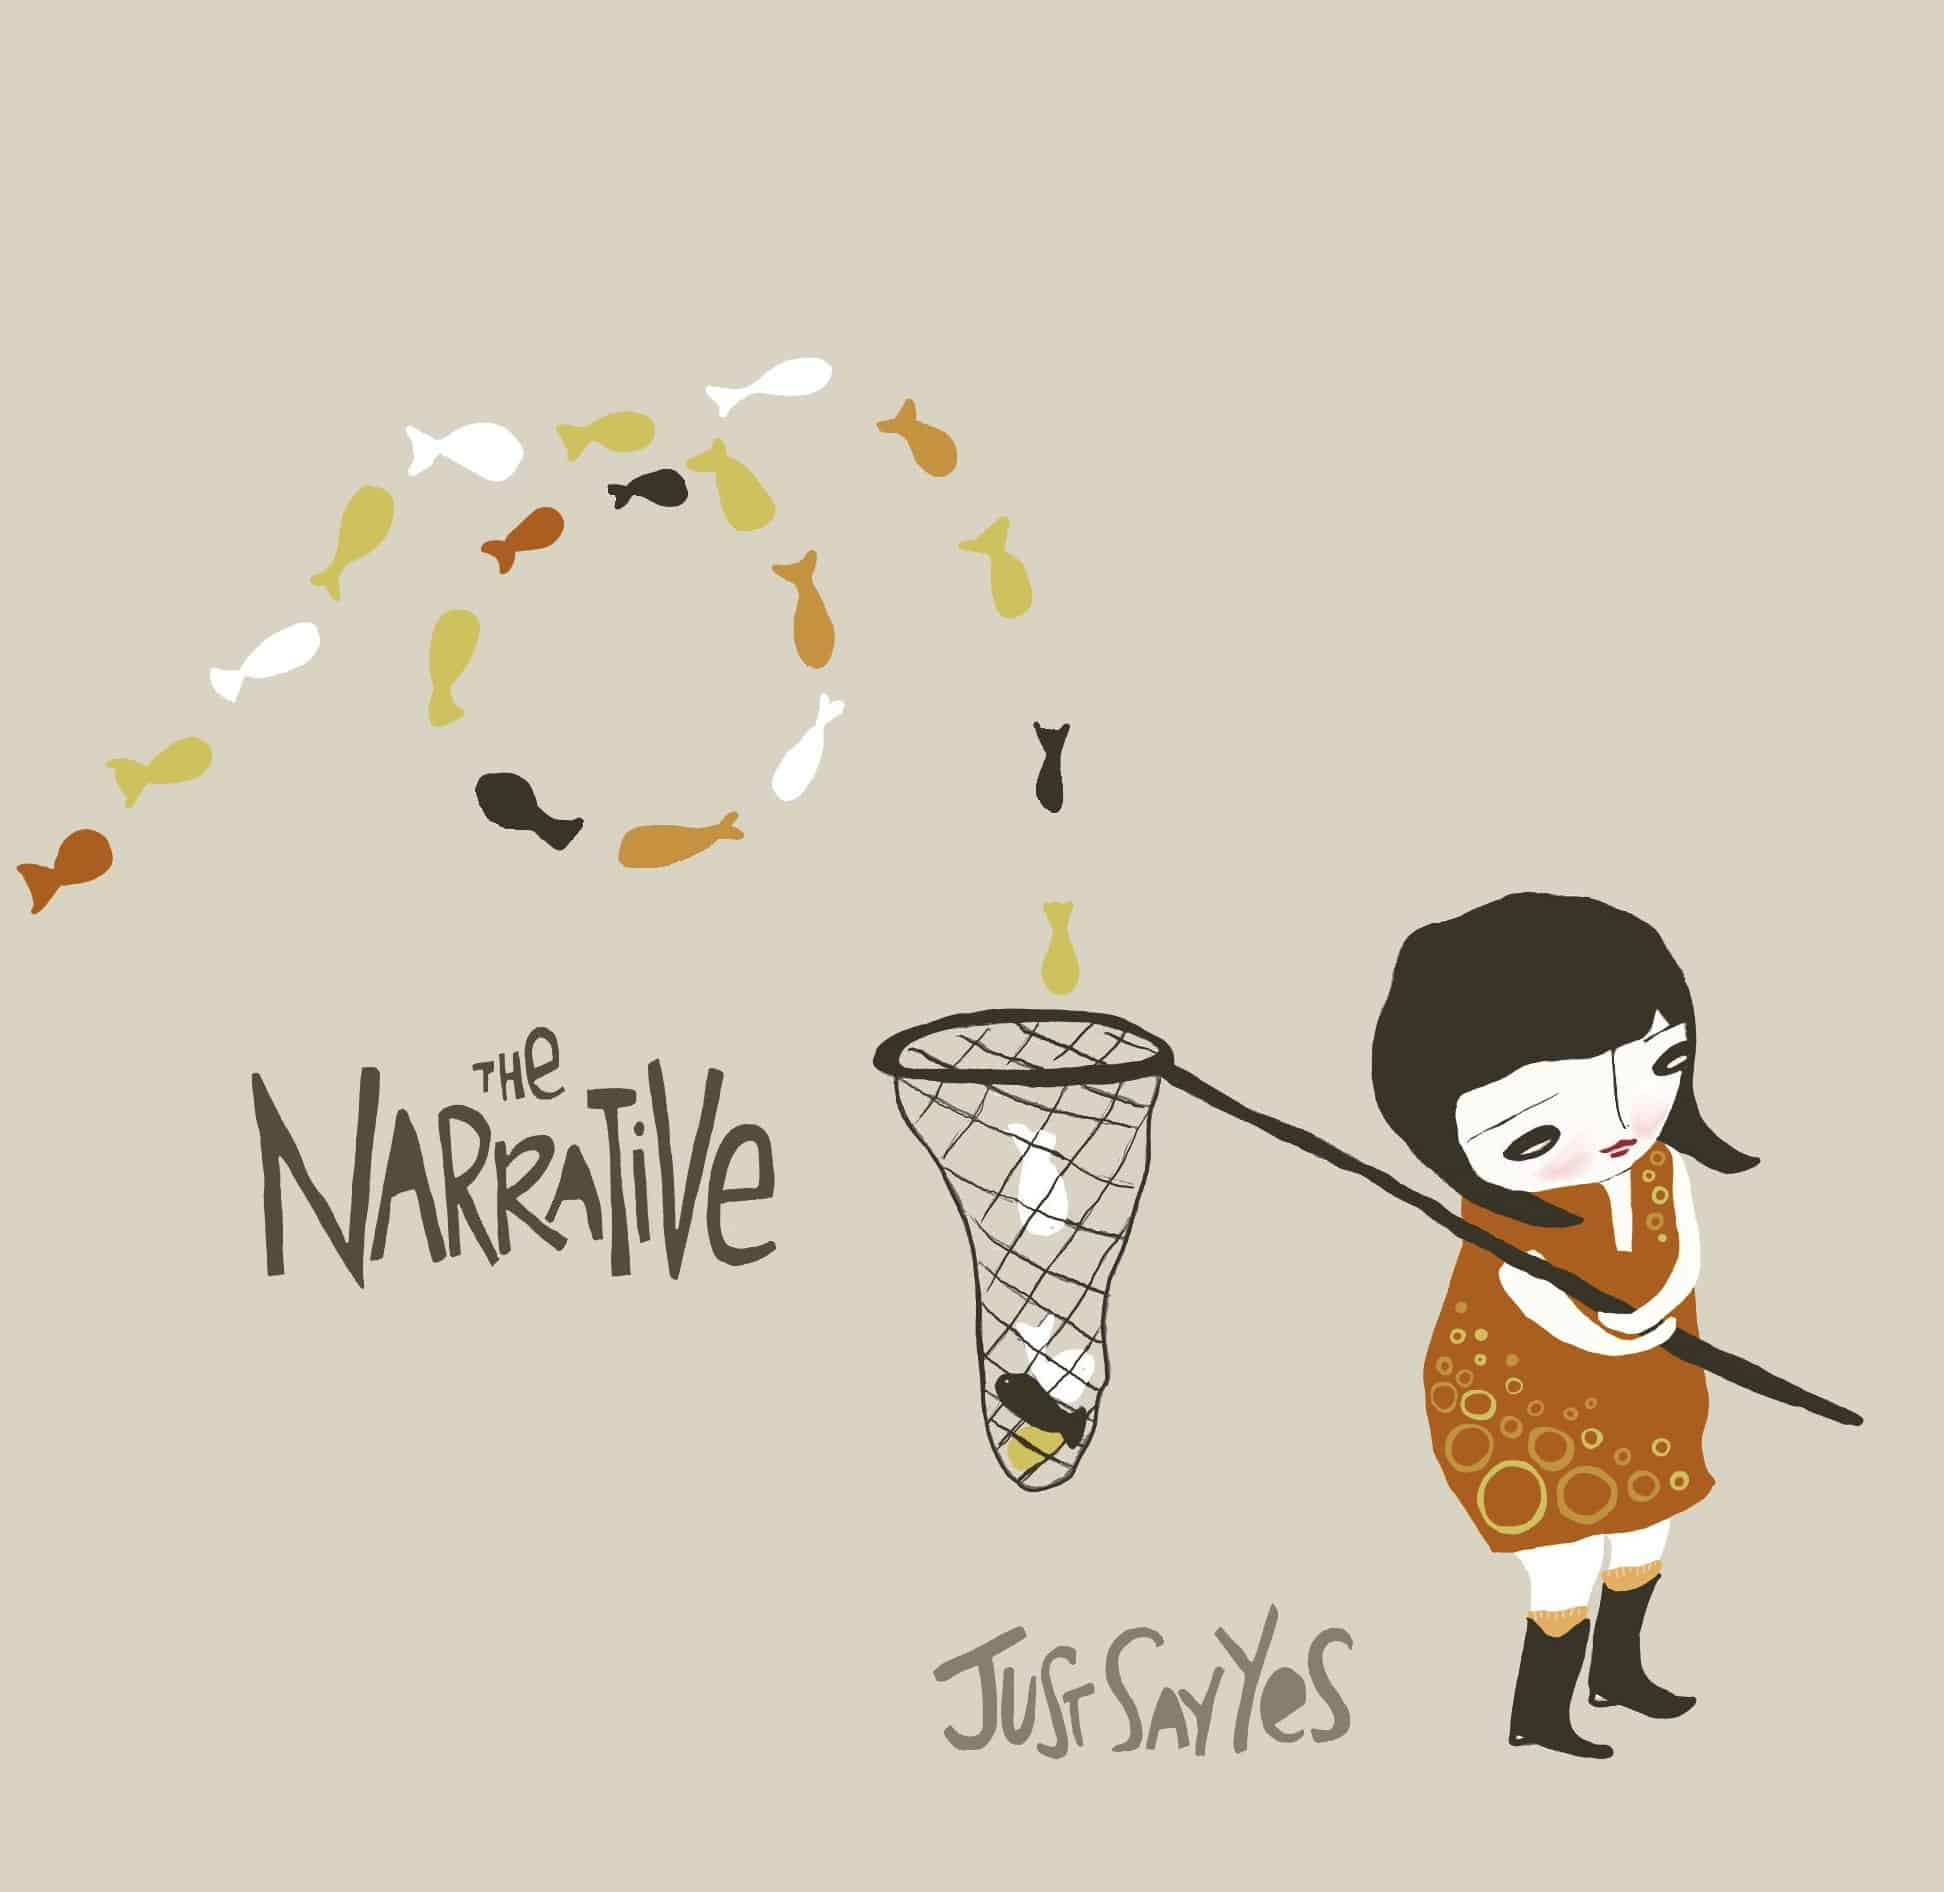 narative